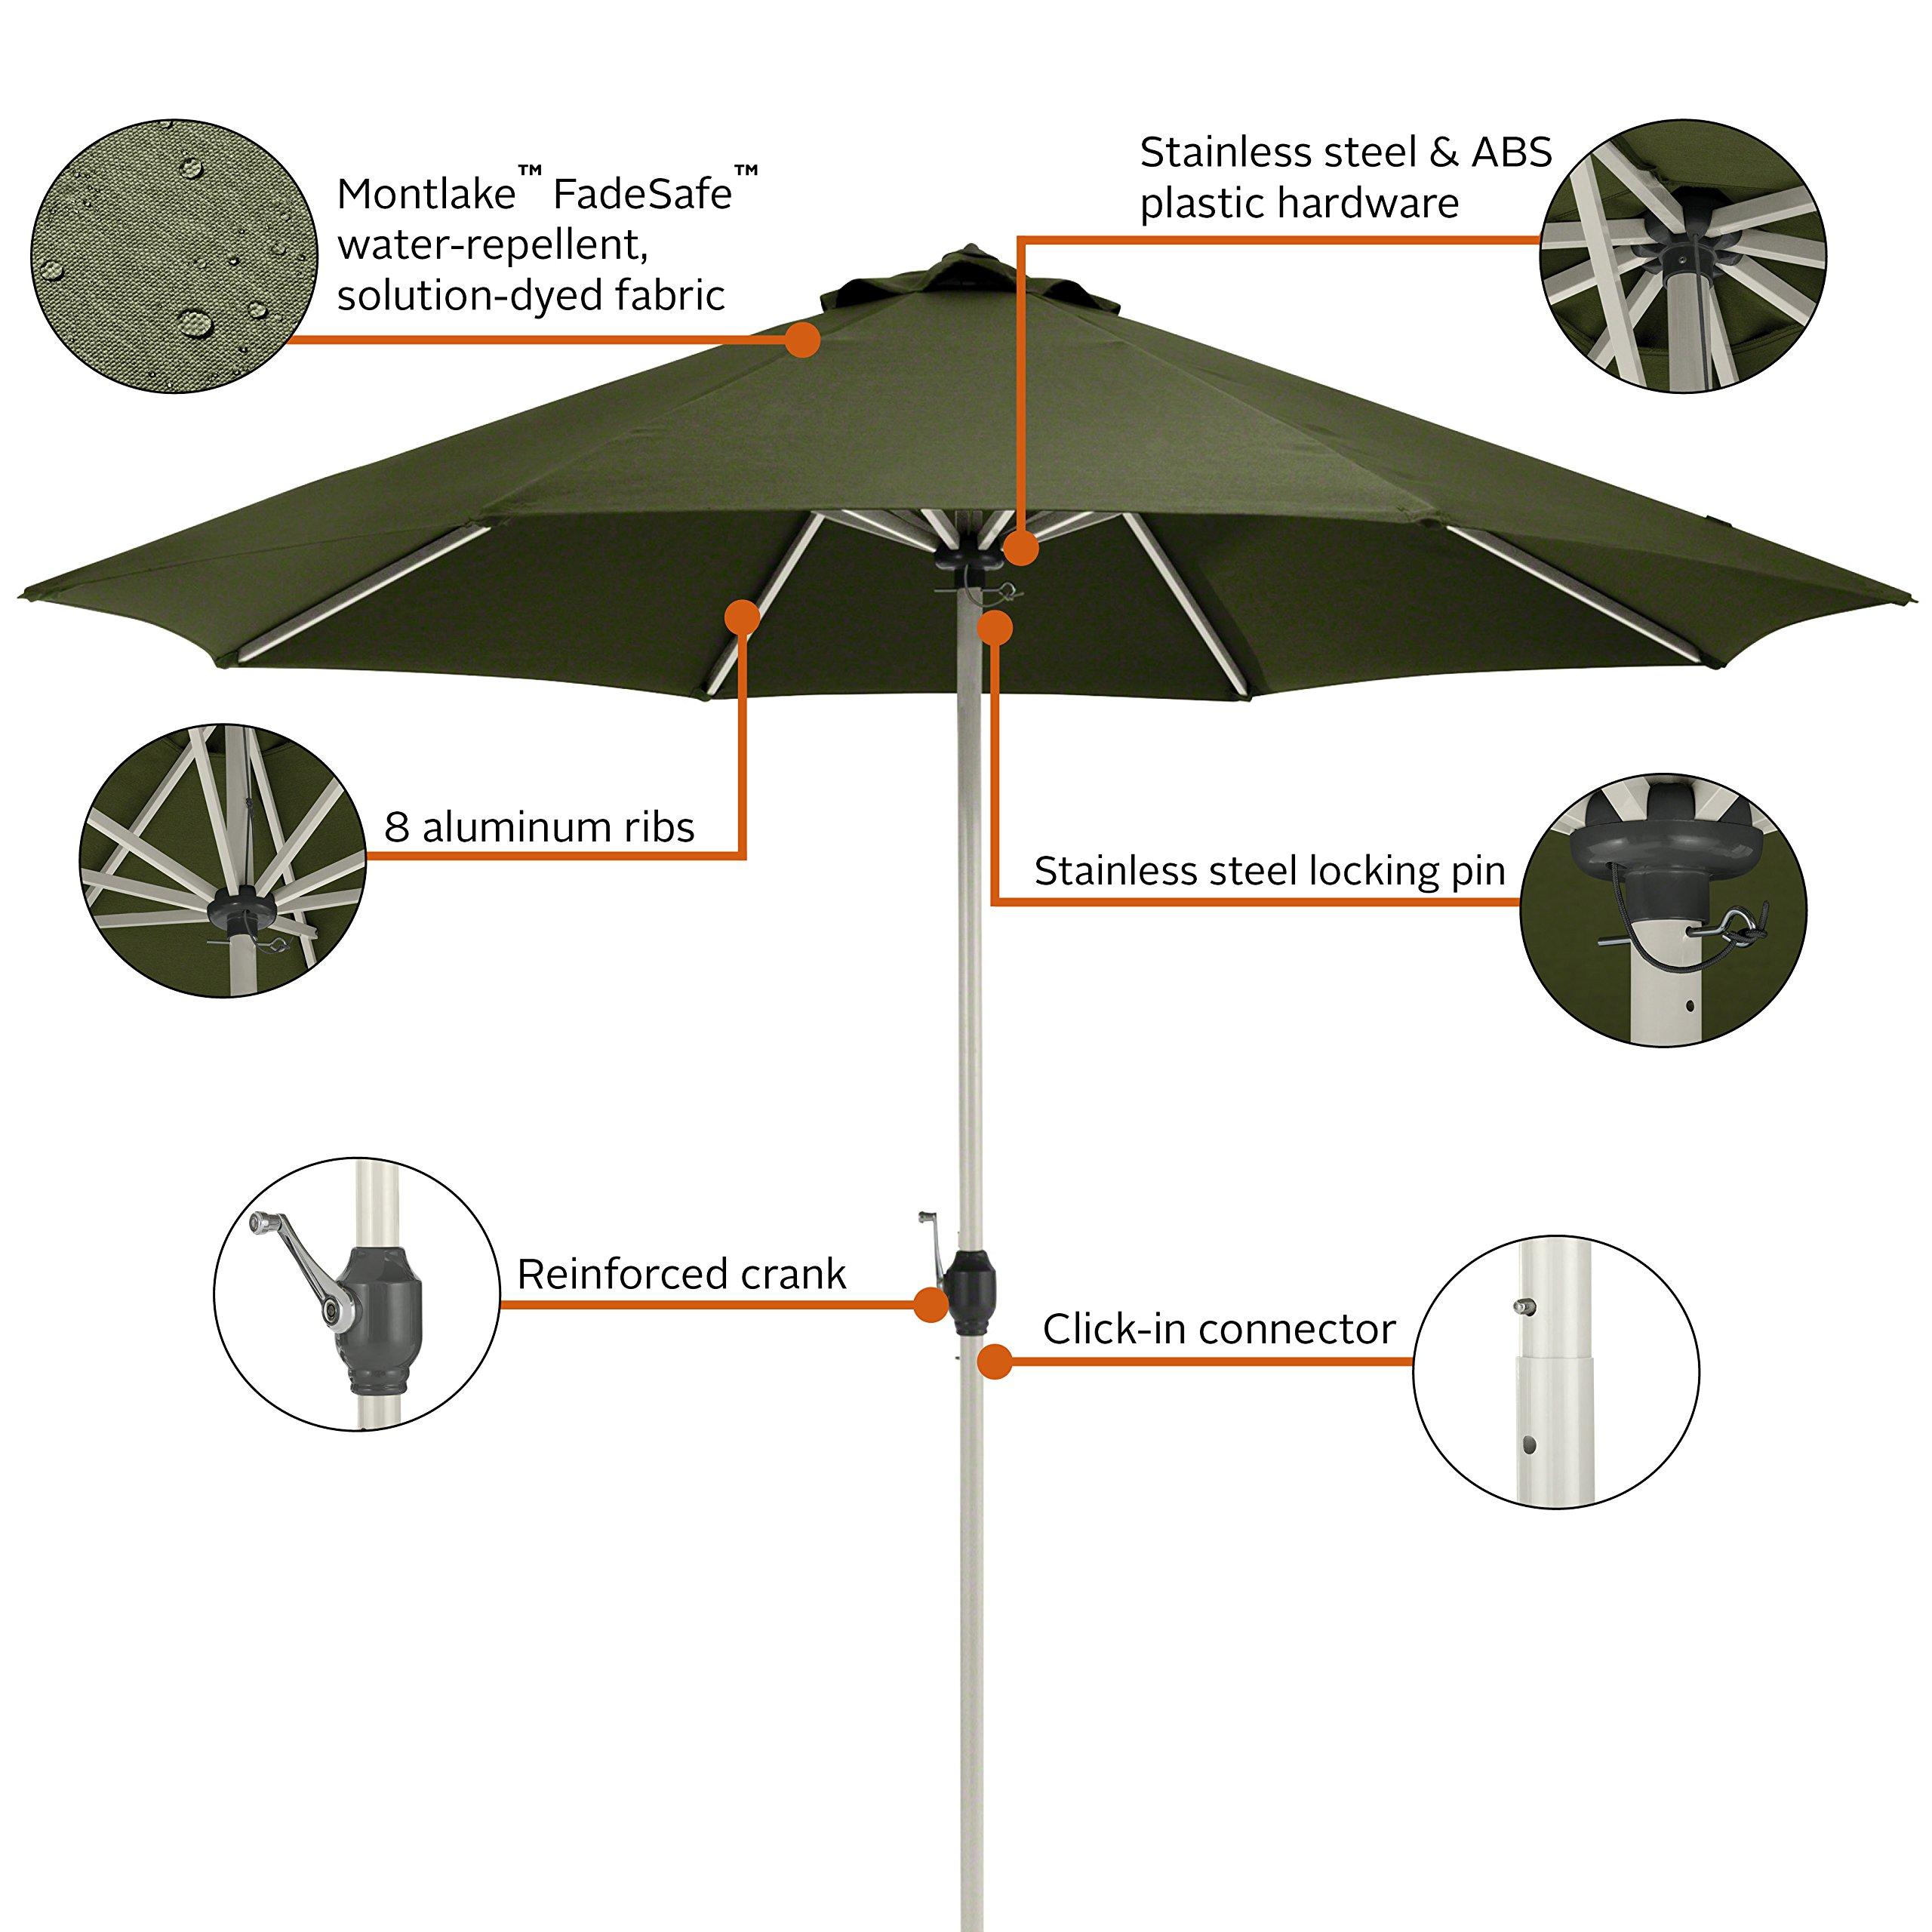 Classic Accessories Montlake FadeSafe 9-Foot Round Aluminum Patio Umbrella, Heather Fern by Classic Accessories (Image #3)